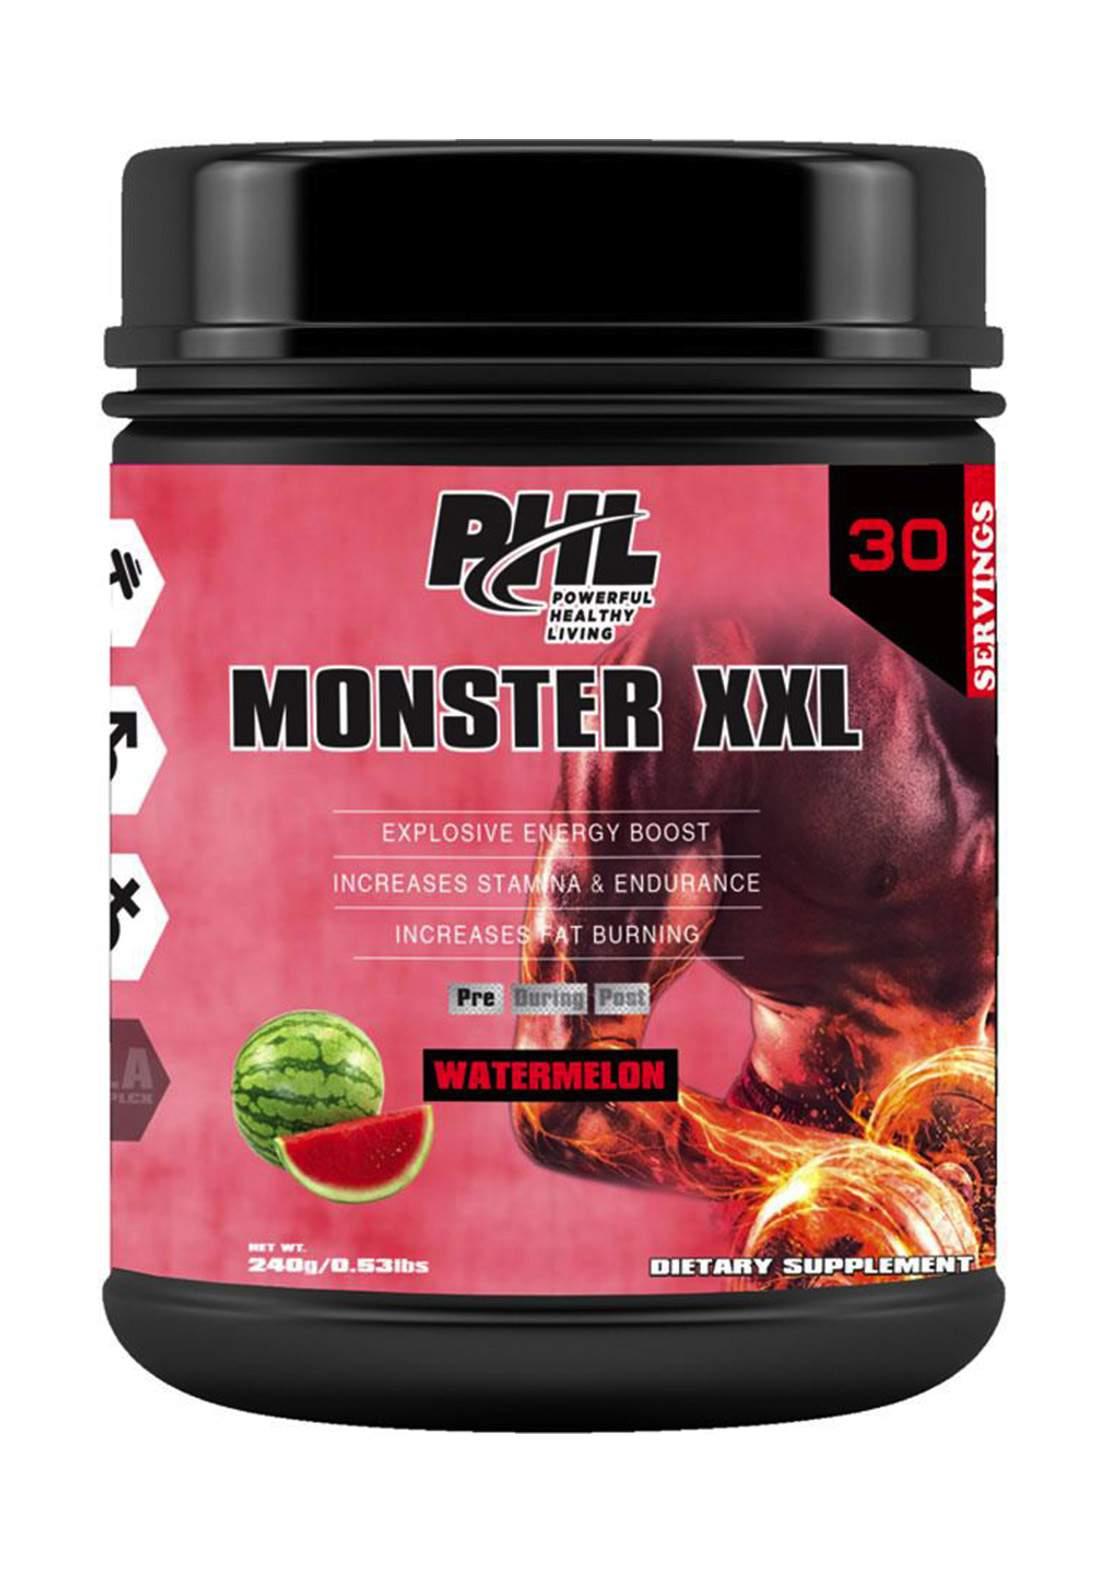 PHL Pre Workout (Monster XXL) PWD watermelon  30 Servings 240 g  مكمل غذائي